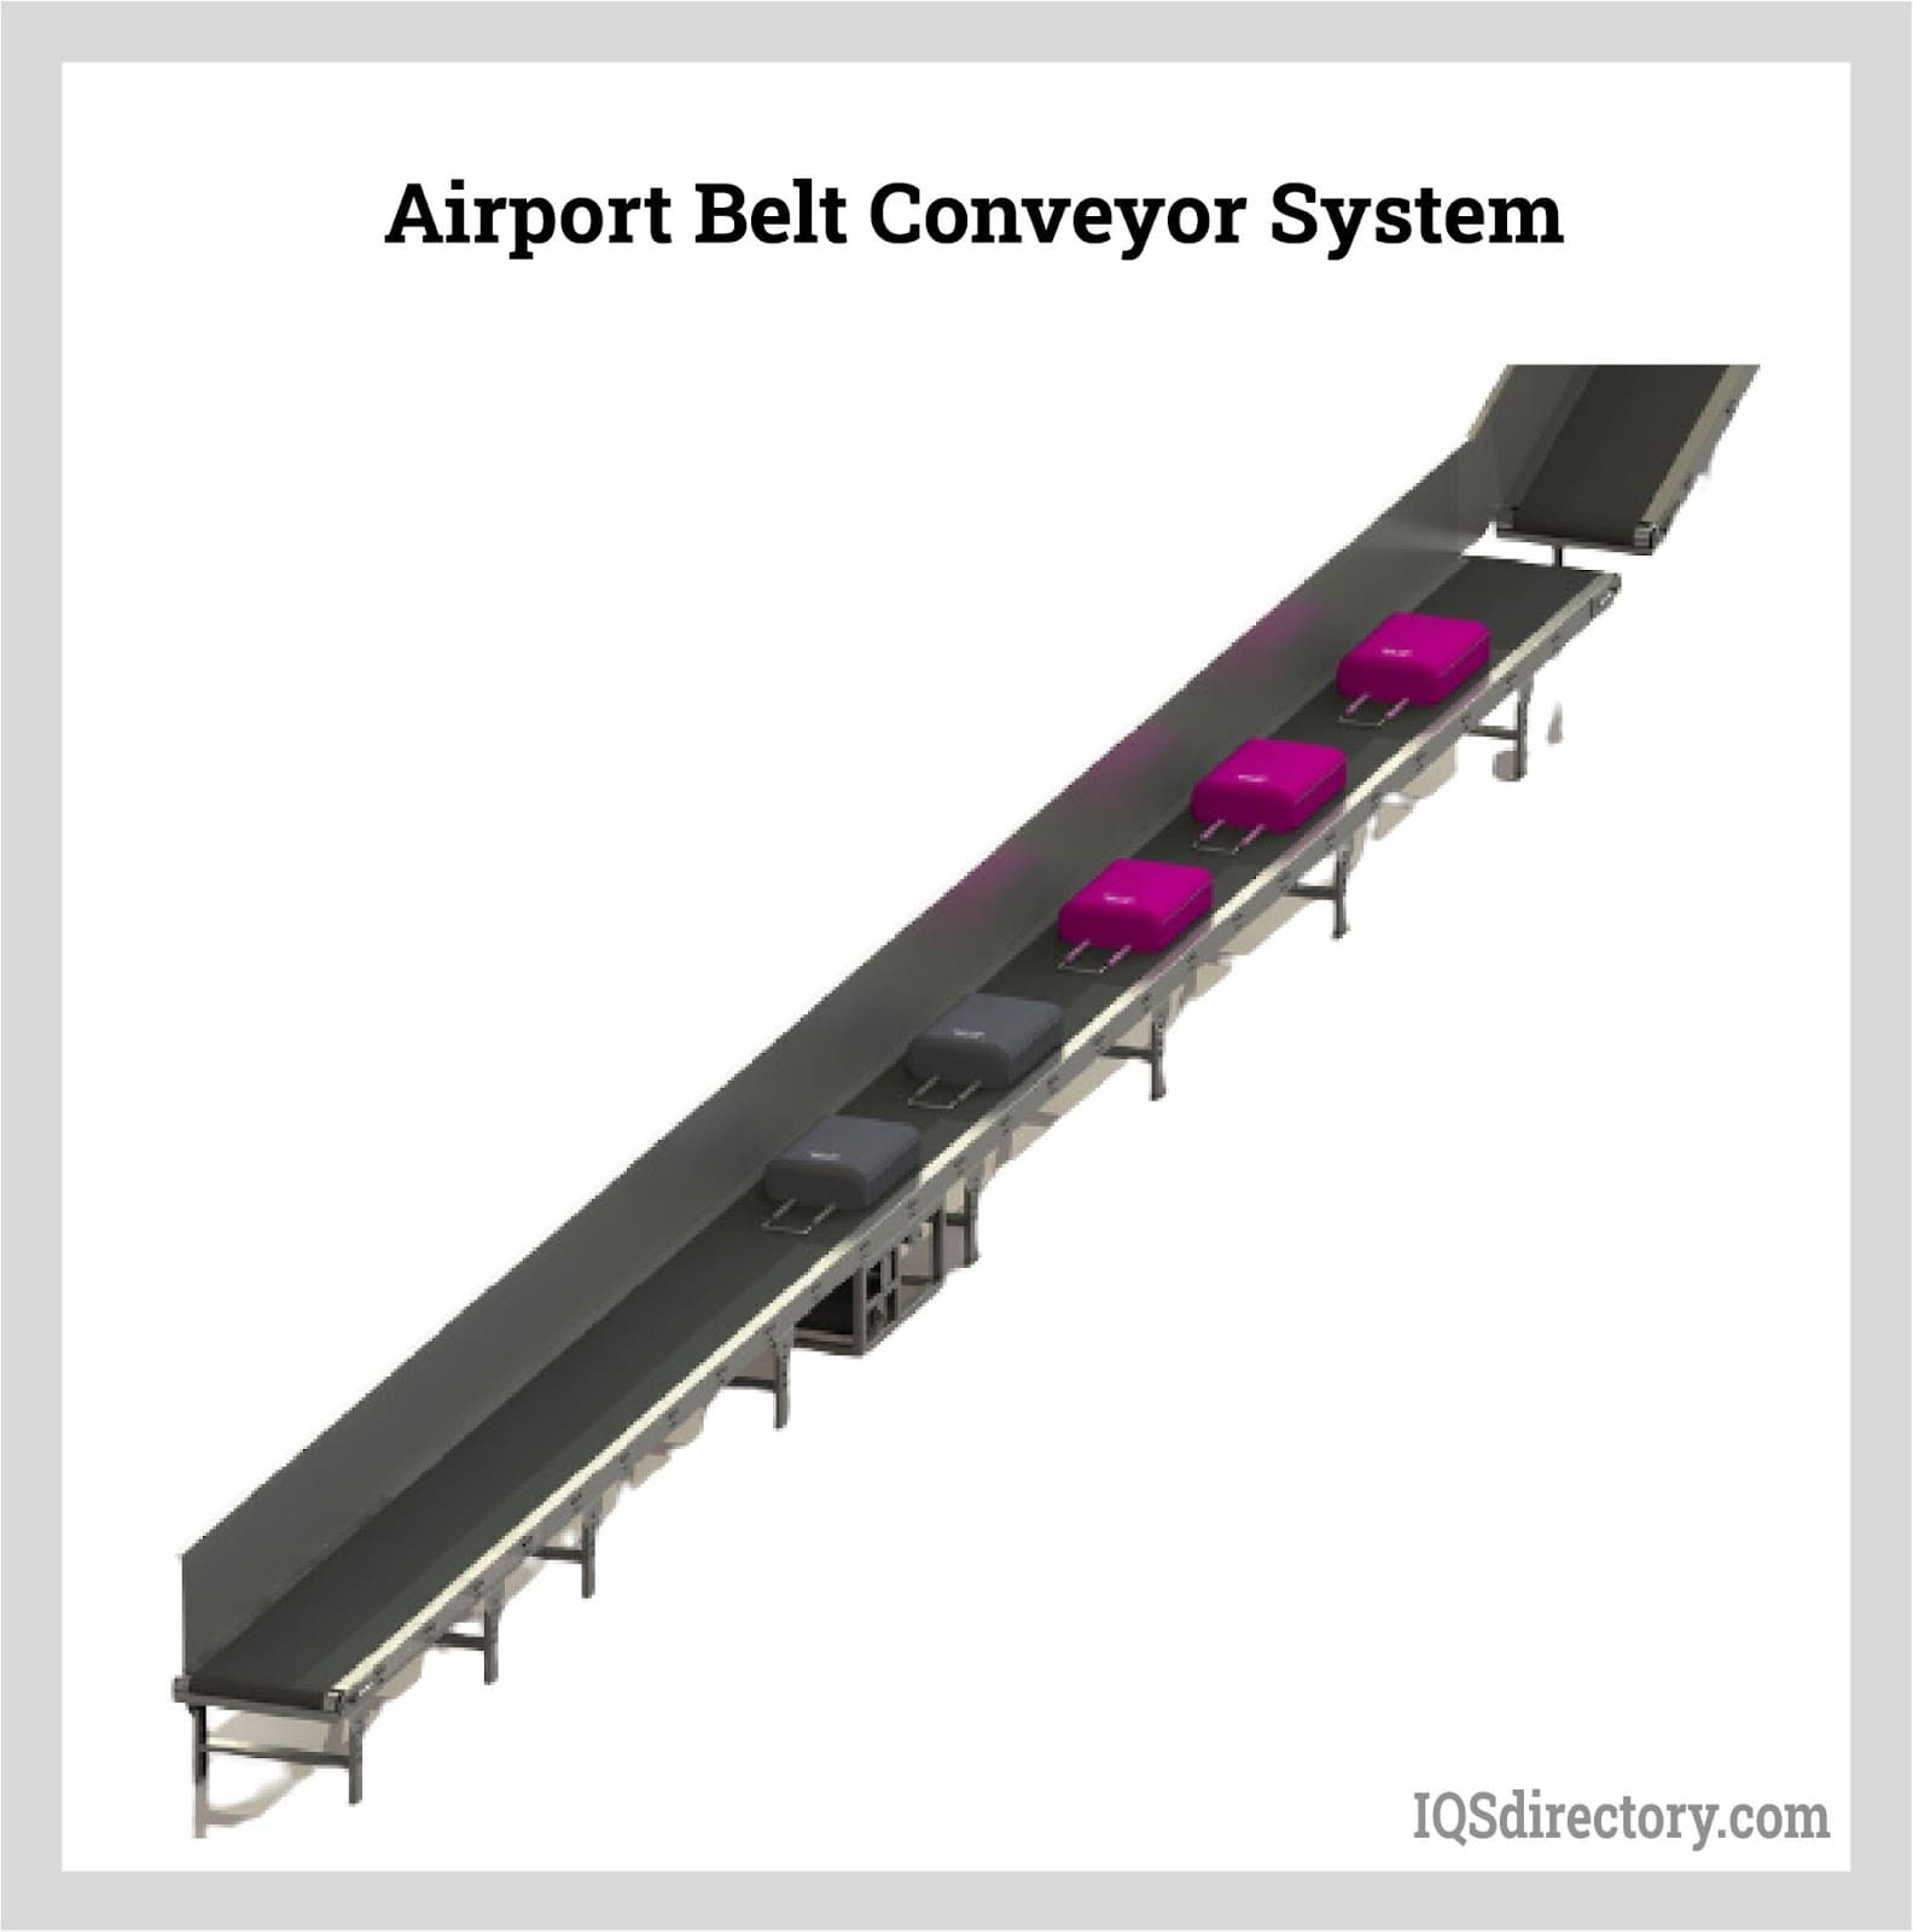 Airport Belt Conveyor System